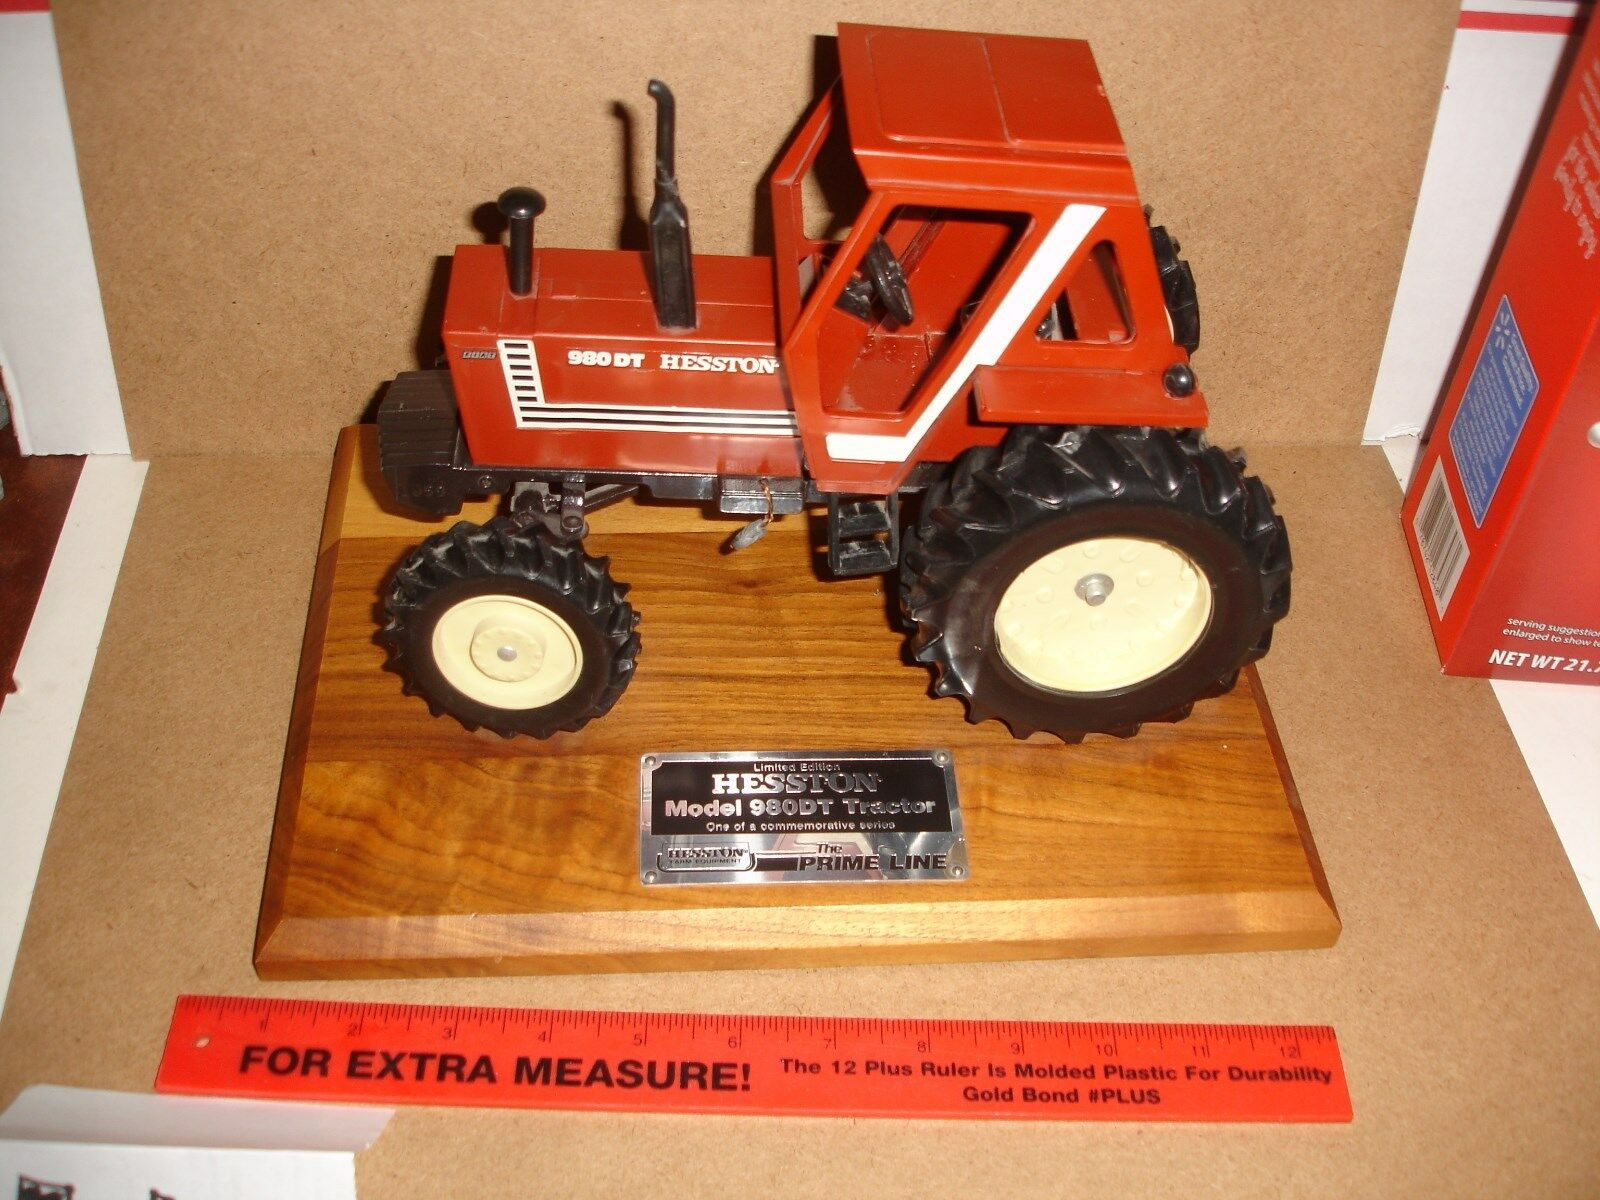 1 16 Heston 980 DT Tractor on trä Plaque